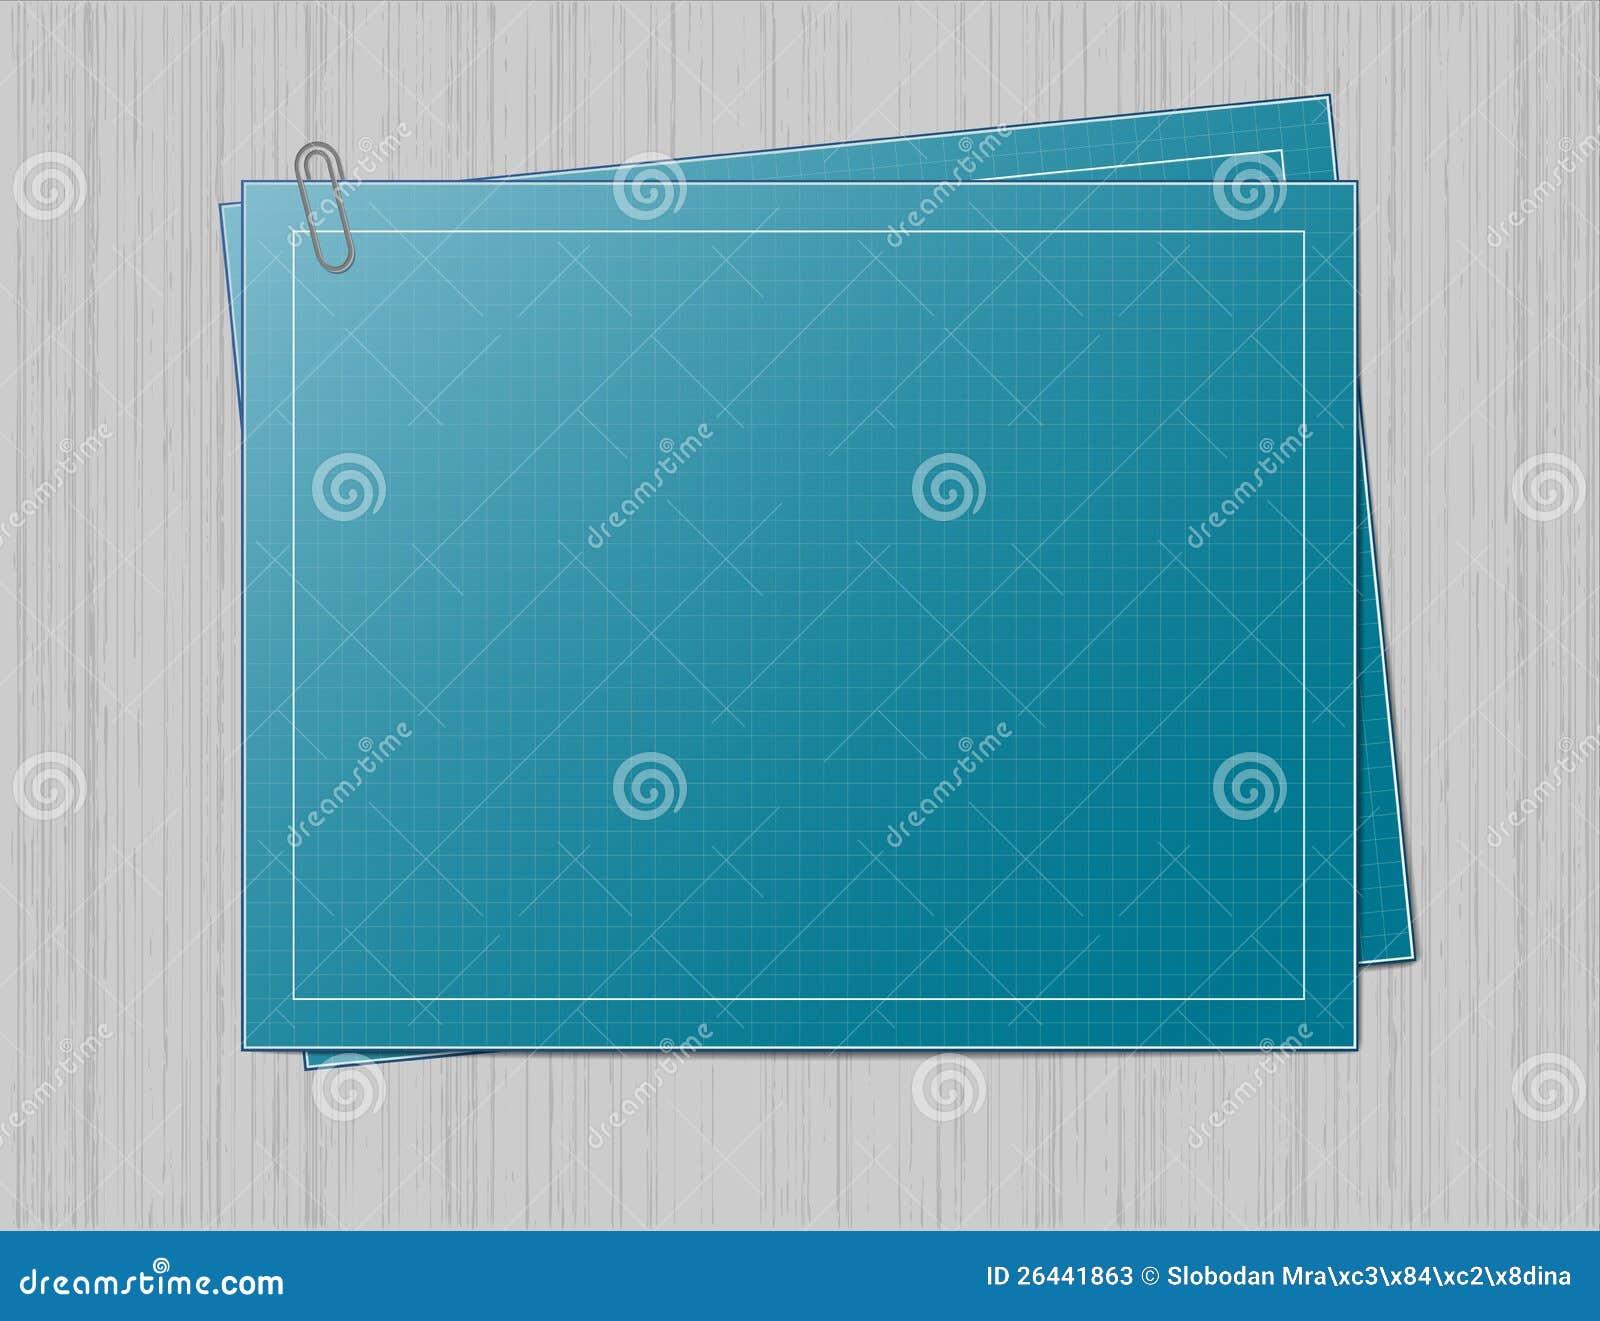 Blueprint paper on grey background stock illustration illustration download blueprint paper on grey background stock illustration illustration of blueprint blue 26441863 malvernweather Images